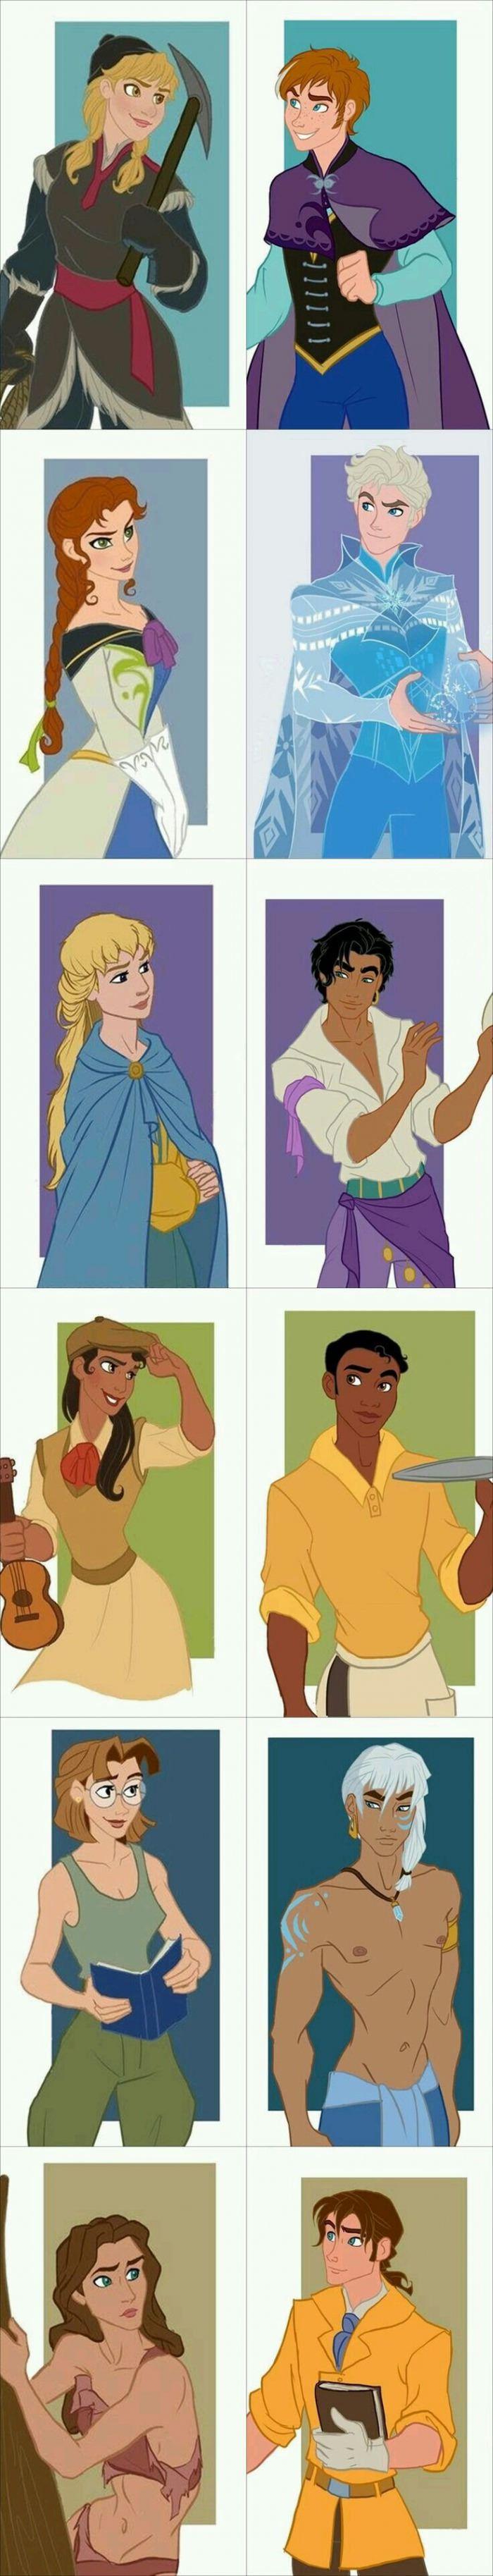 Just some Disney gender bends Kristoff, Anna, Hans, Elsa, Febo, Esmeralda, Naveen, Diana, Milo, Kida, Tarzan, Jane